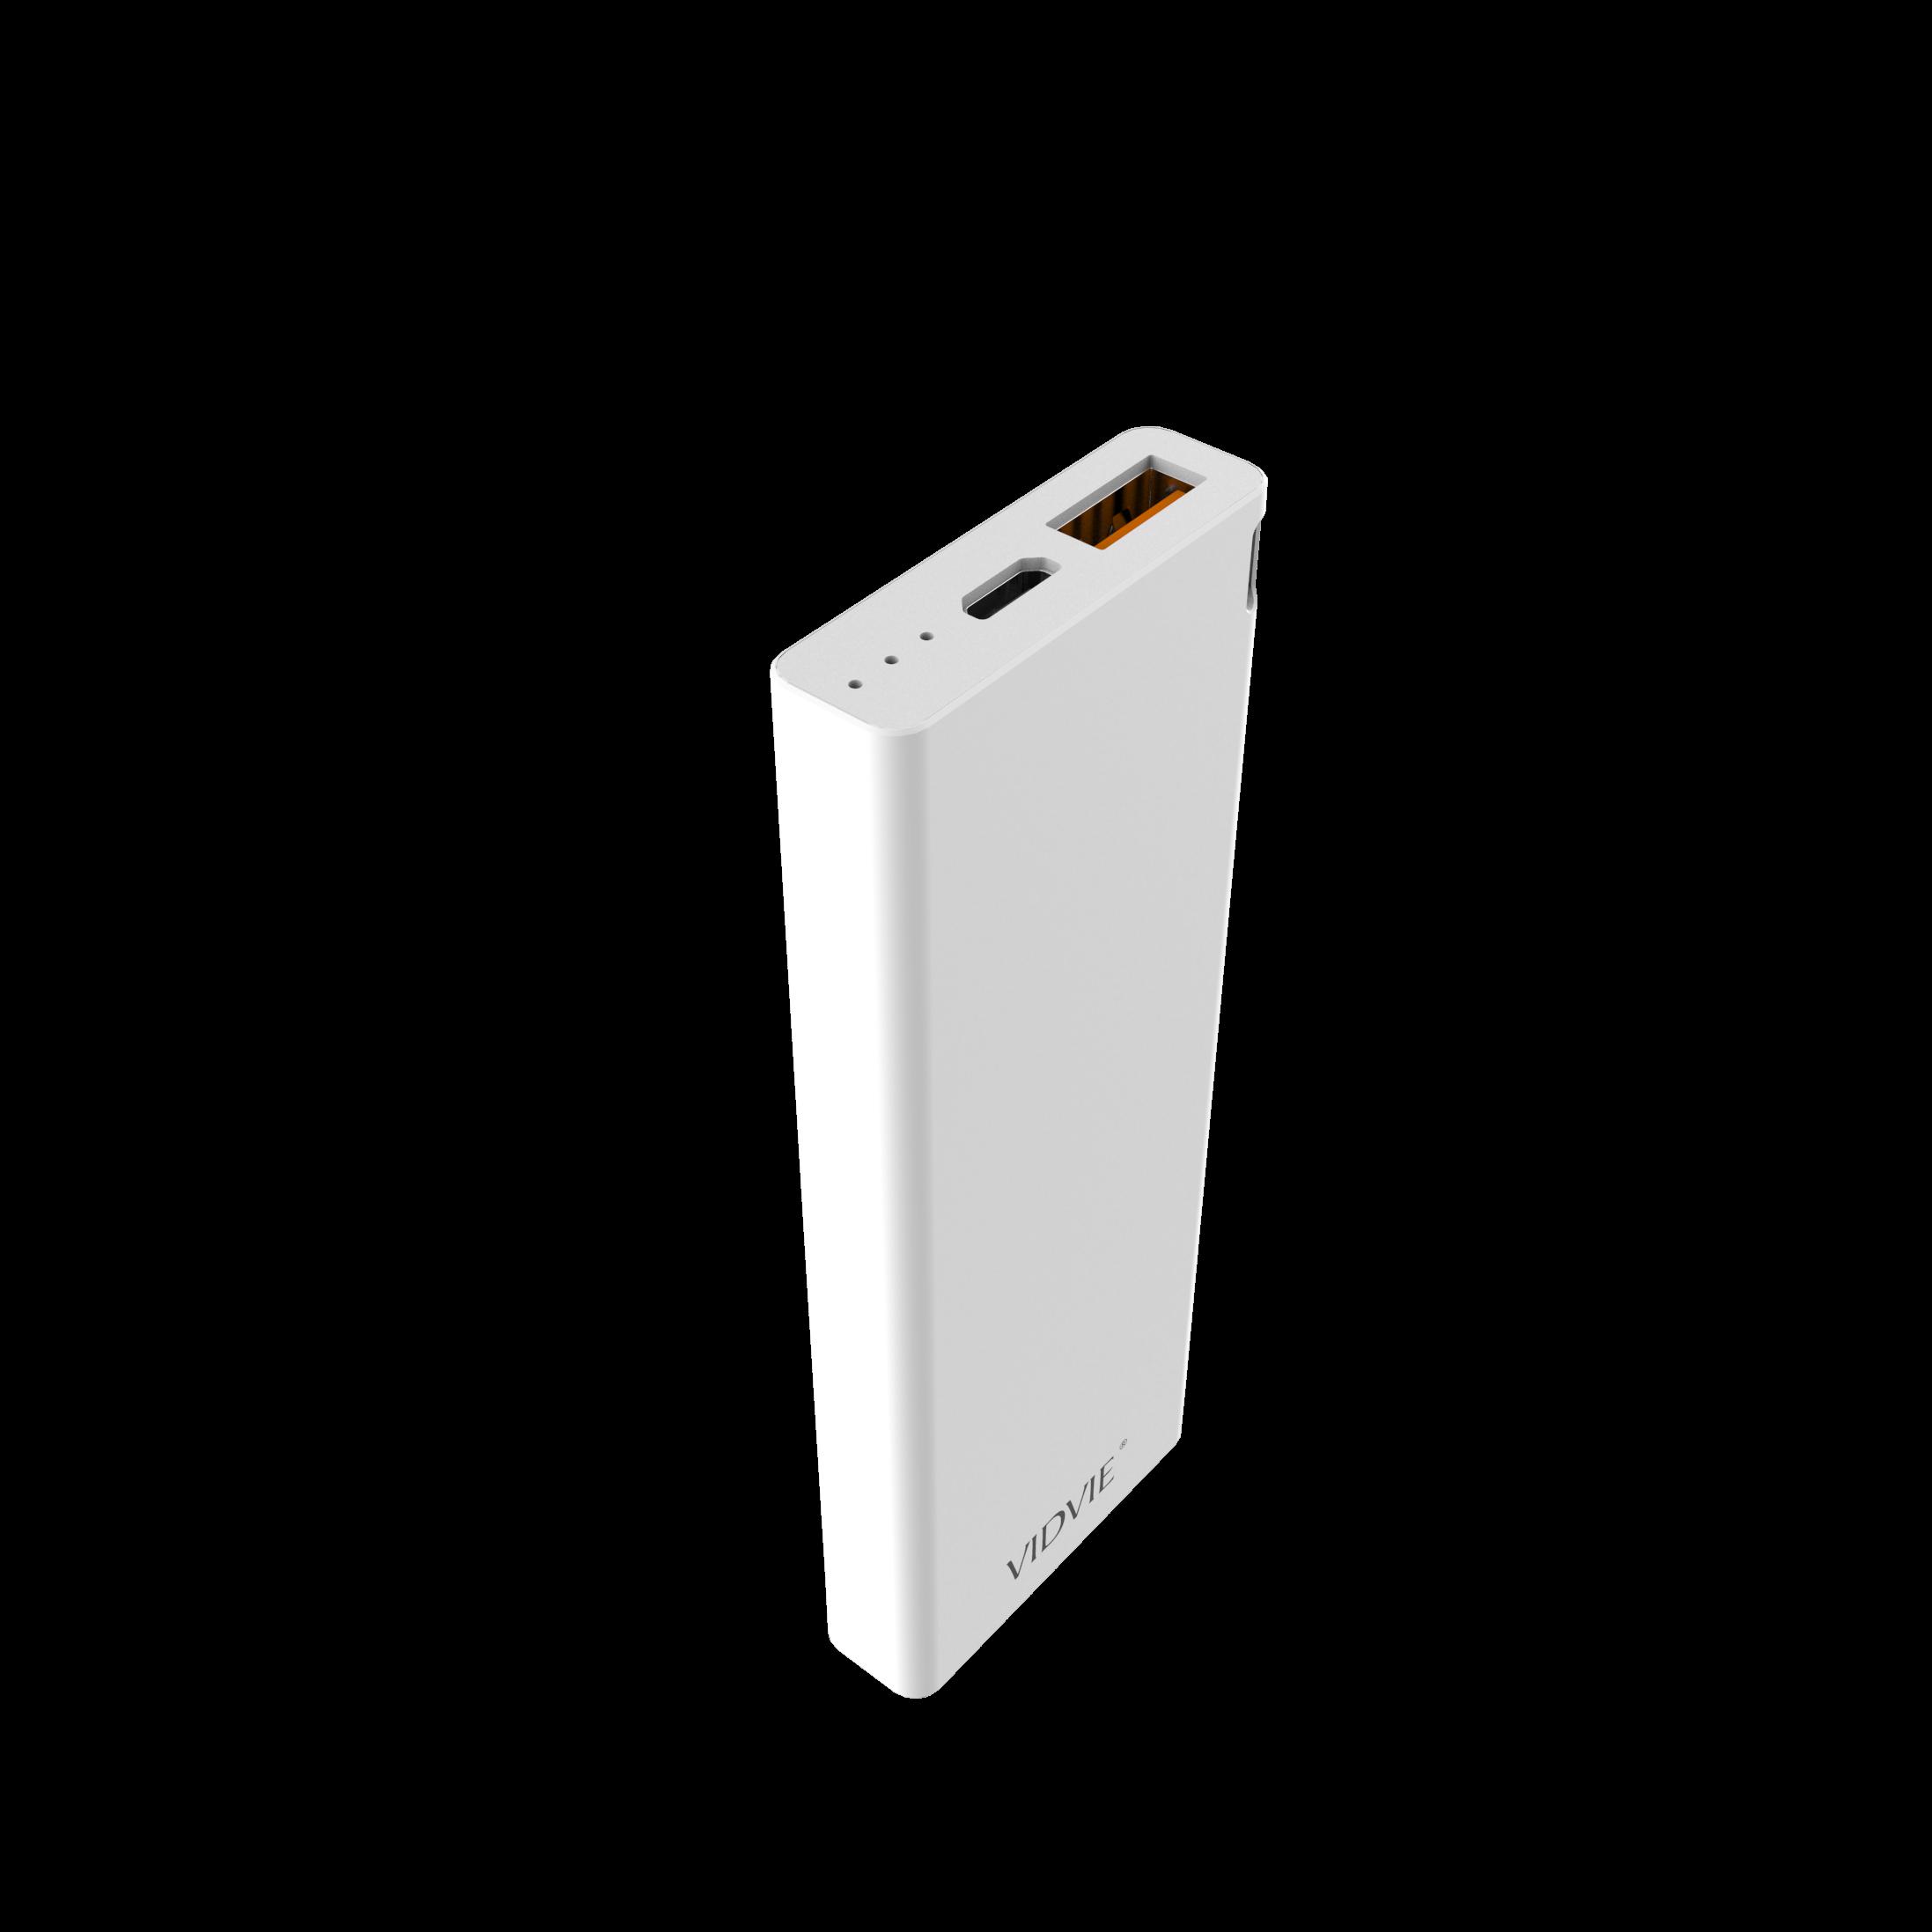 6000 mAh POWER BANK polymer core Shell VIDVIE - PB713 WHITE